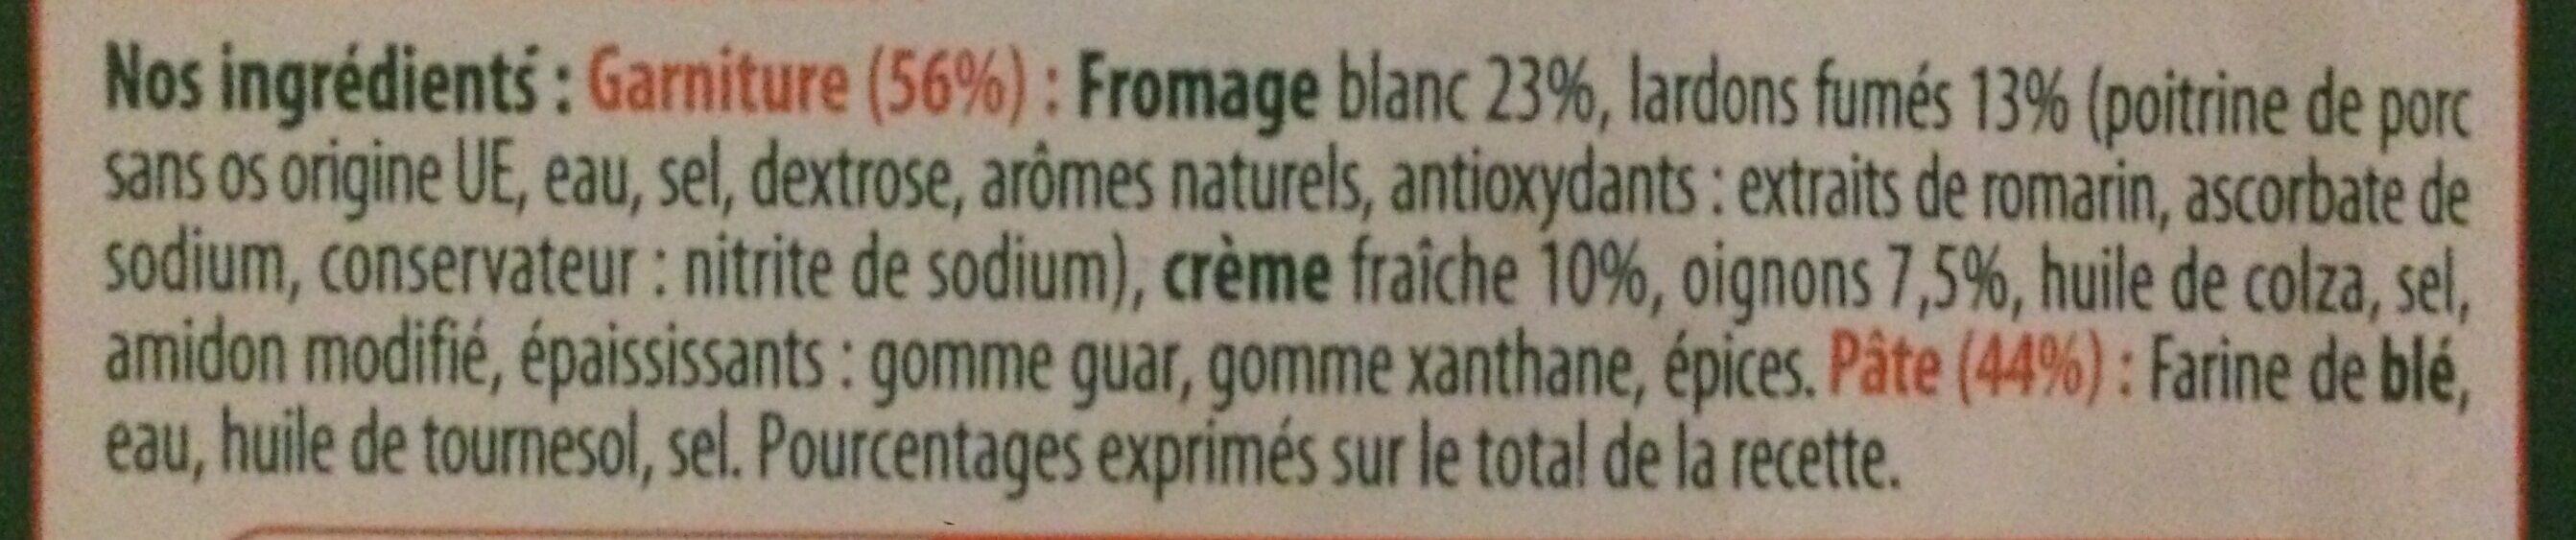 Stoeffler Flammekueche lardons oignons les 3 Flammekueches de 350 g - Ingrédients - fr